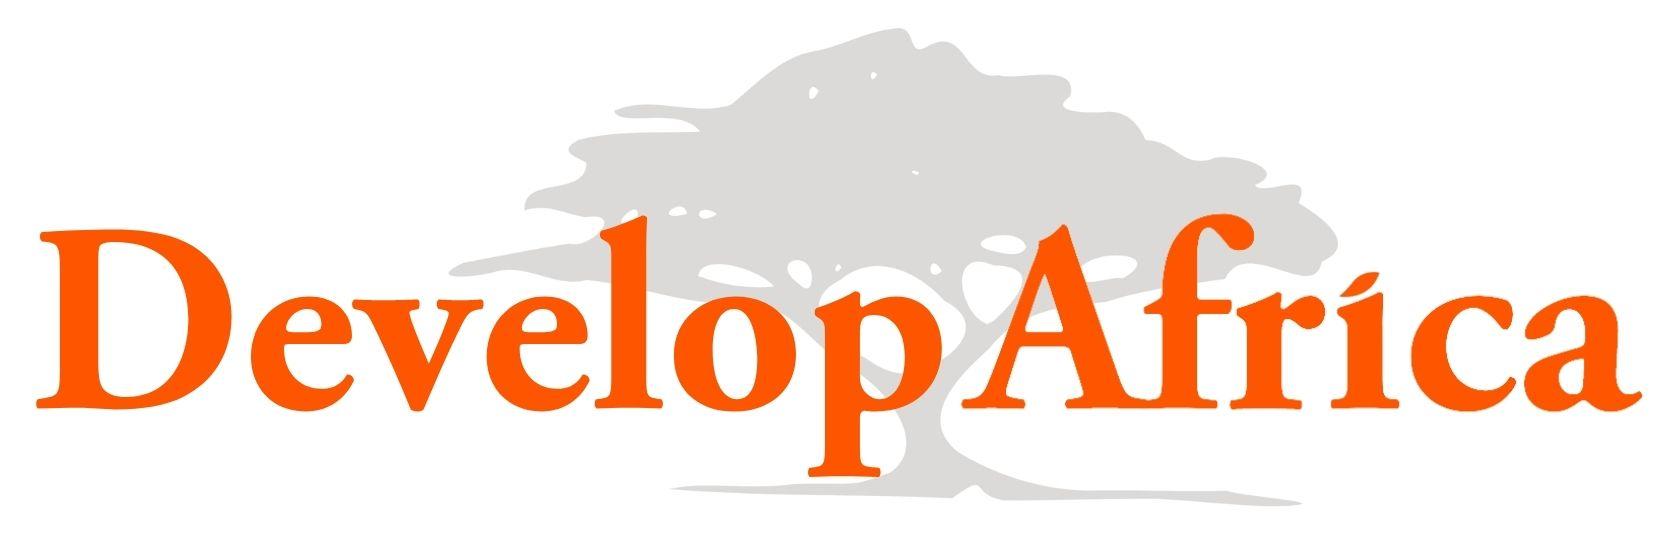 Develop Africa, Inc. Logo